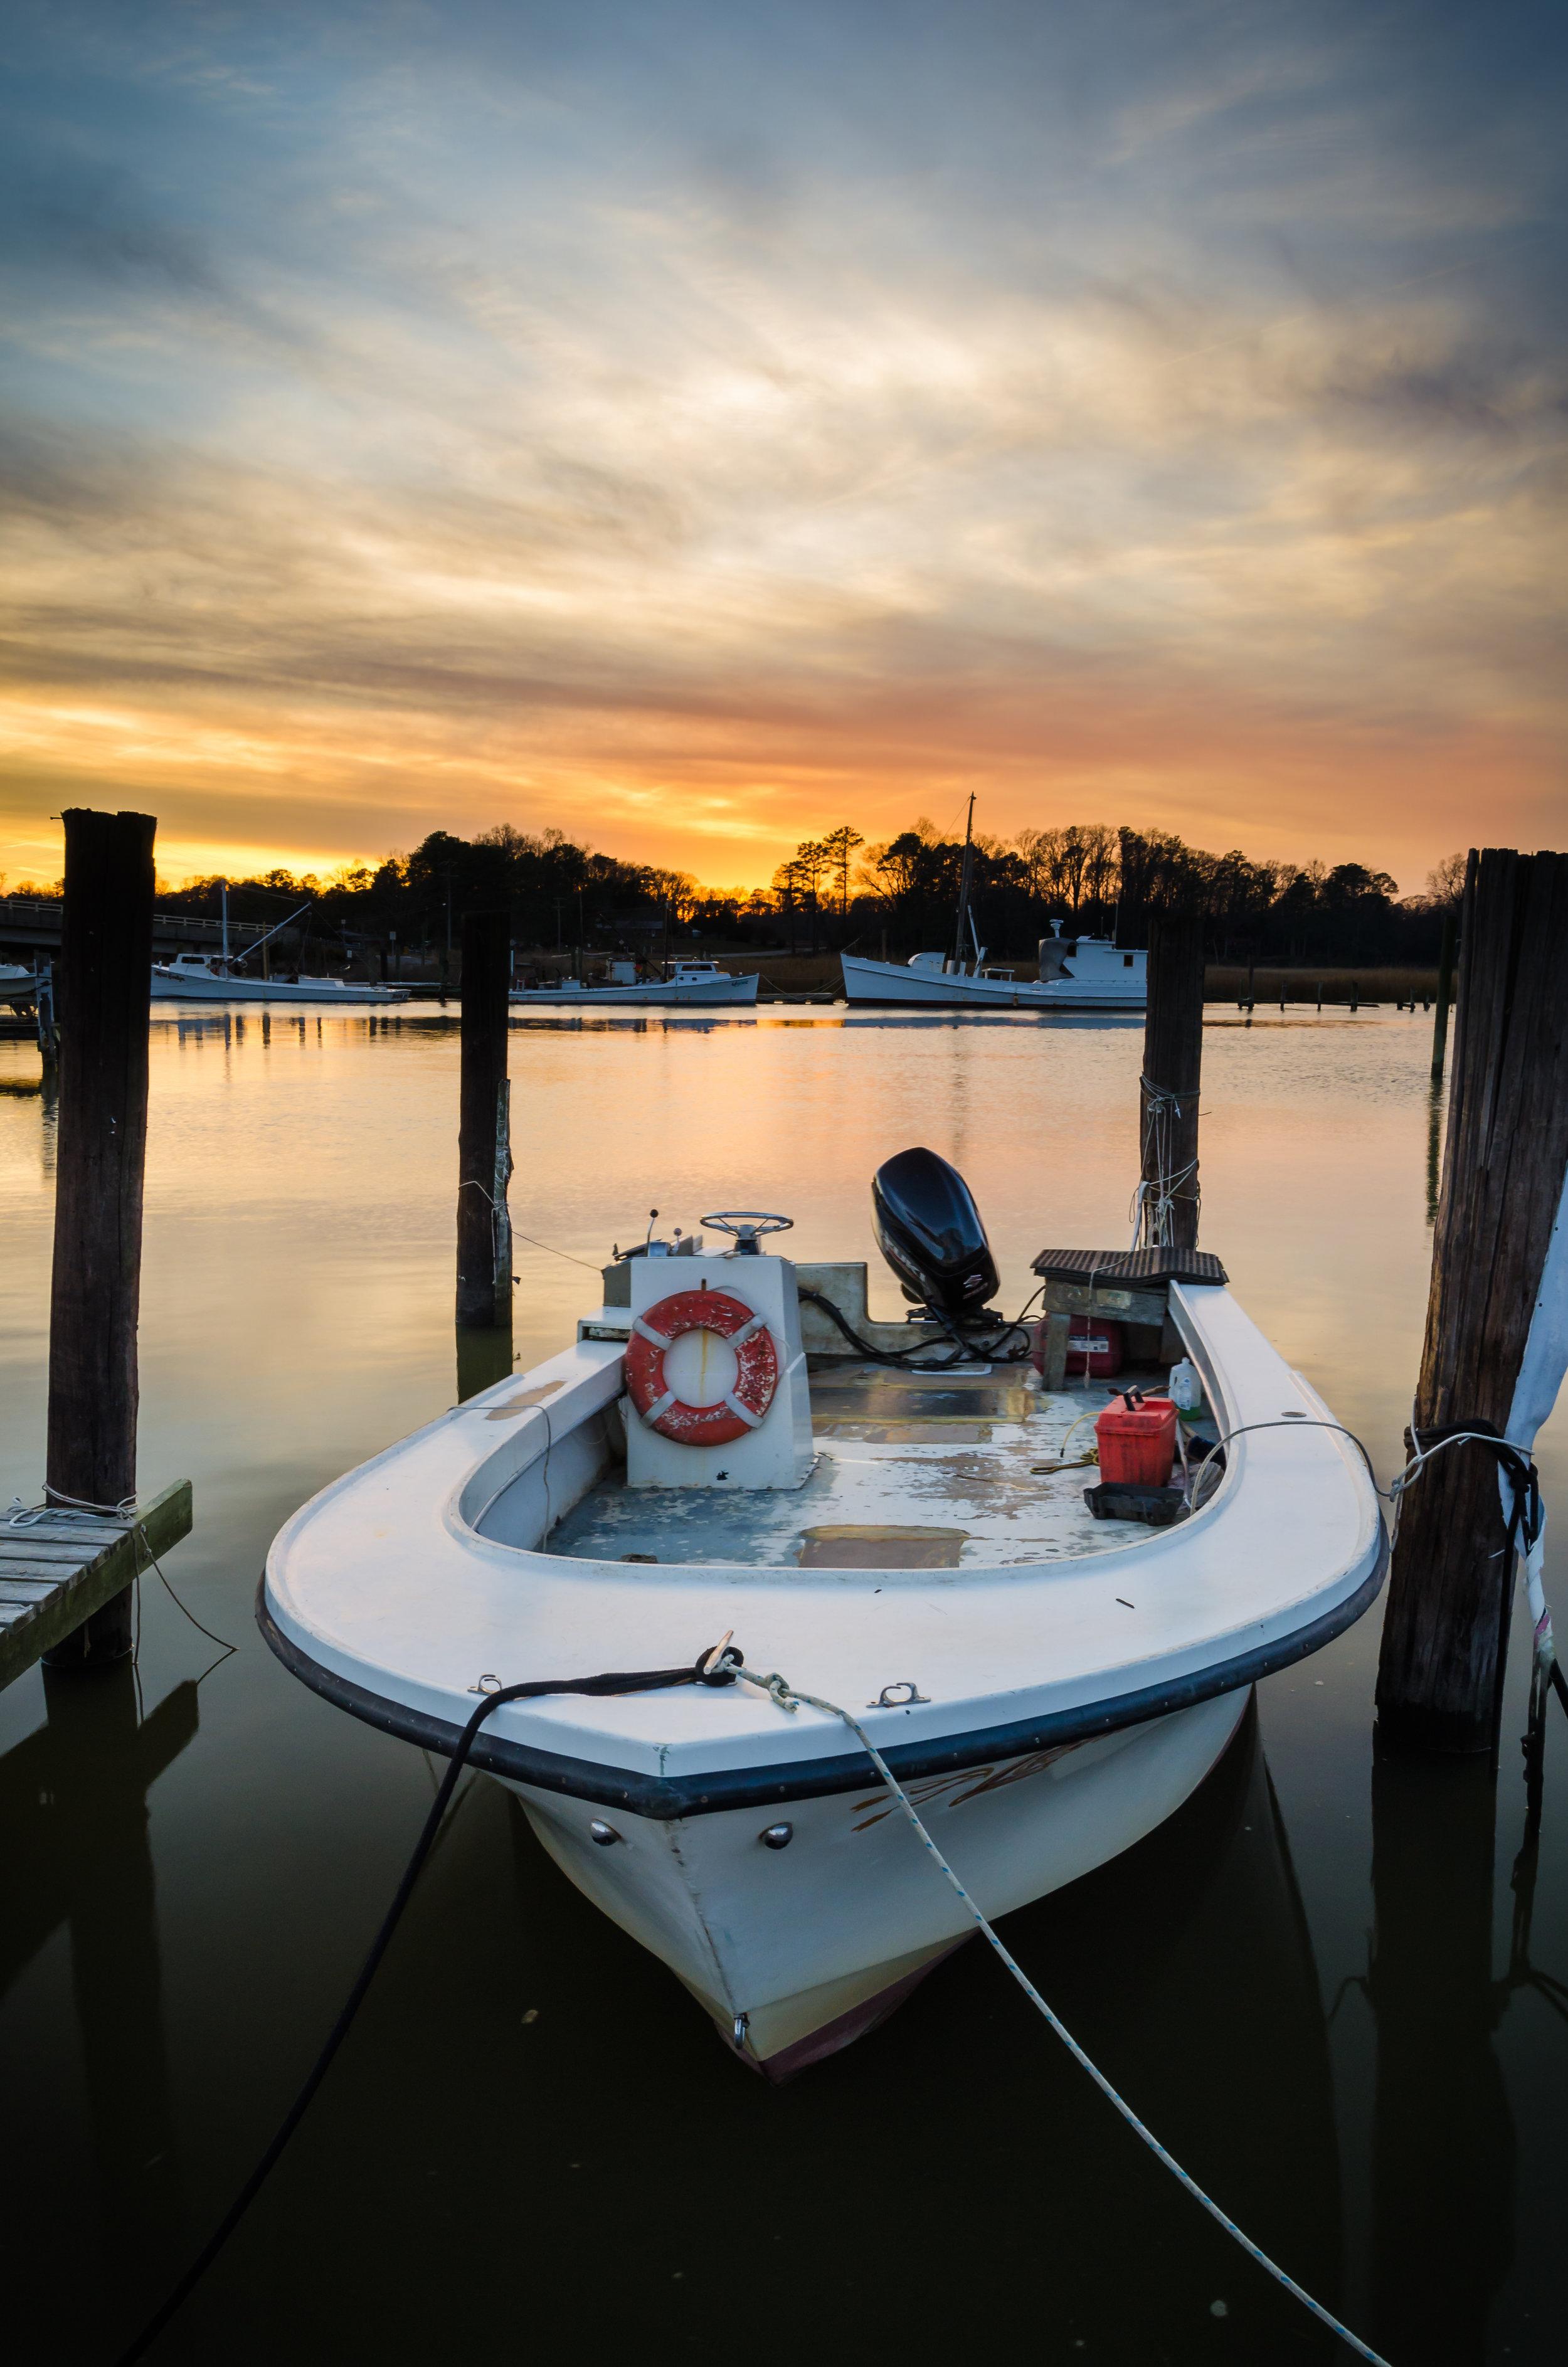 rescue-jones creek-pier-isle of wight county-virginia-sunset-boat.jpg